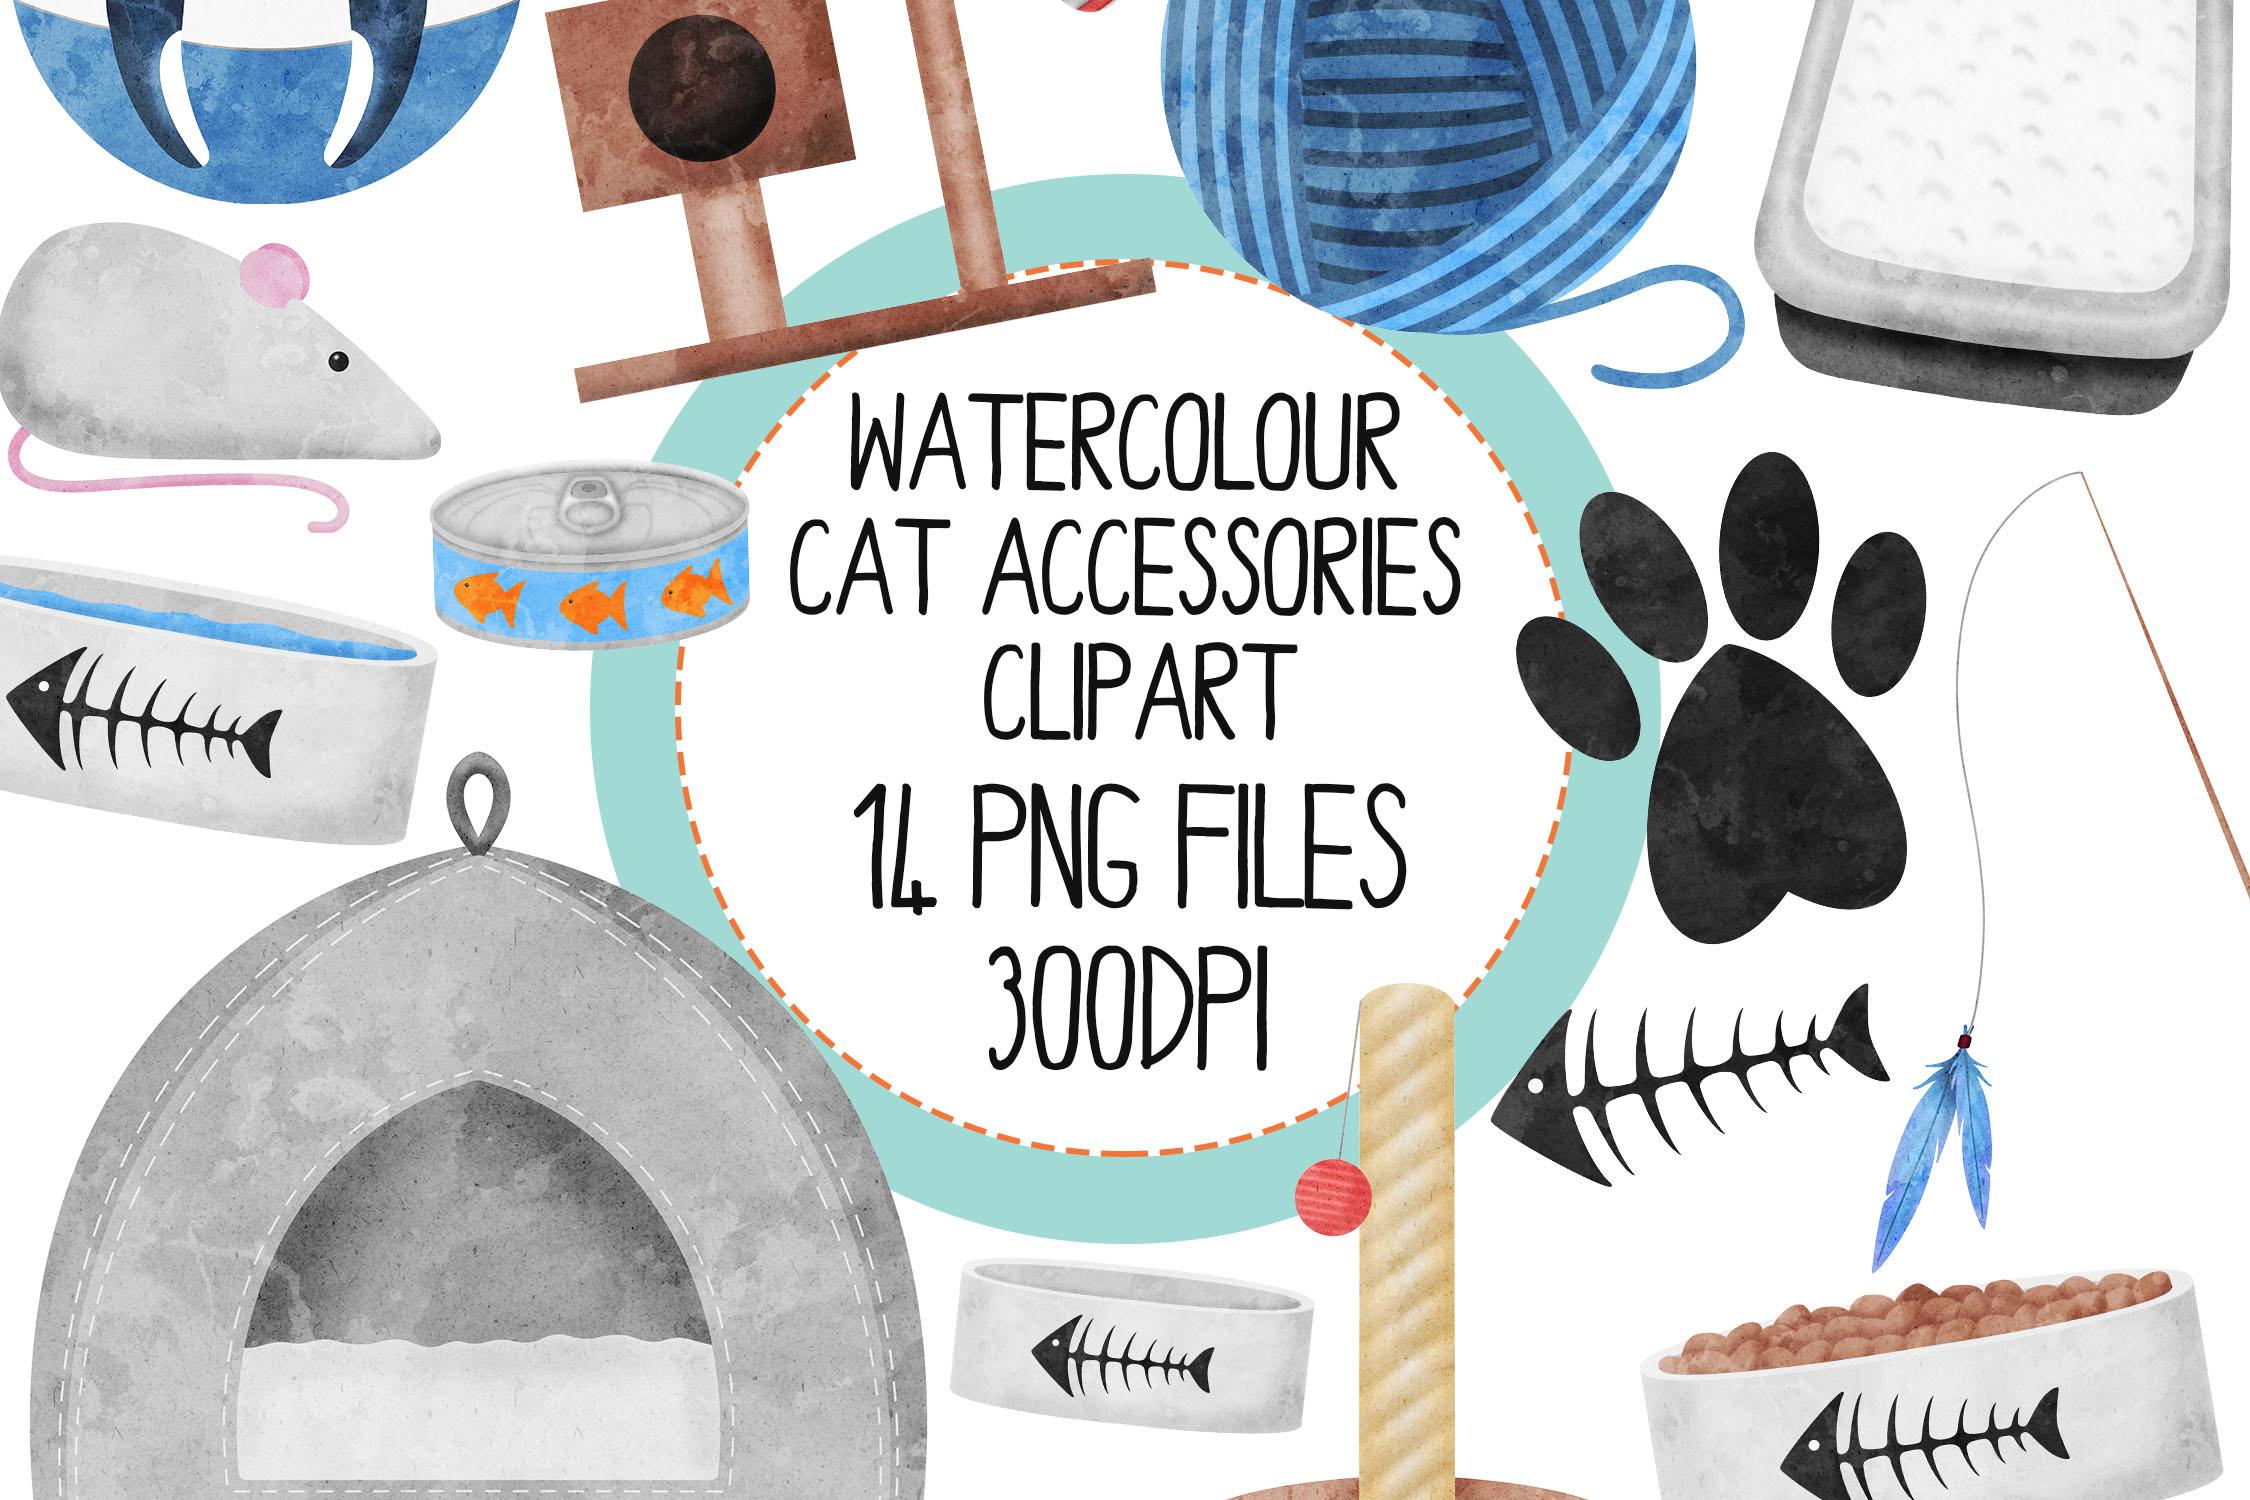 Watercolor Cat AccessoriesClipart Set example image 1